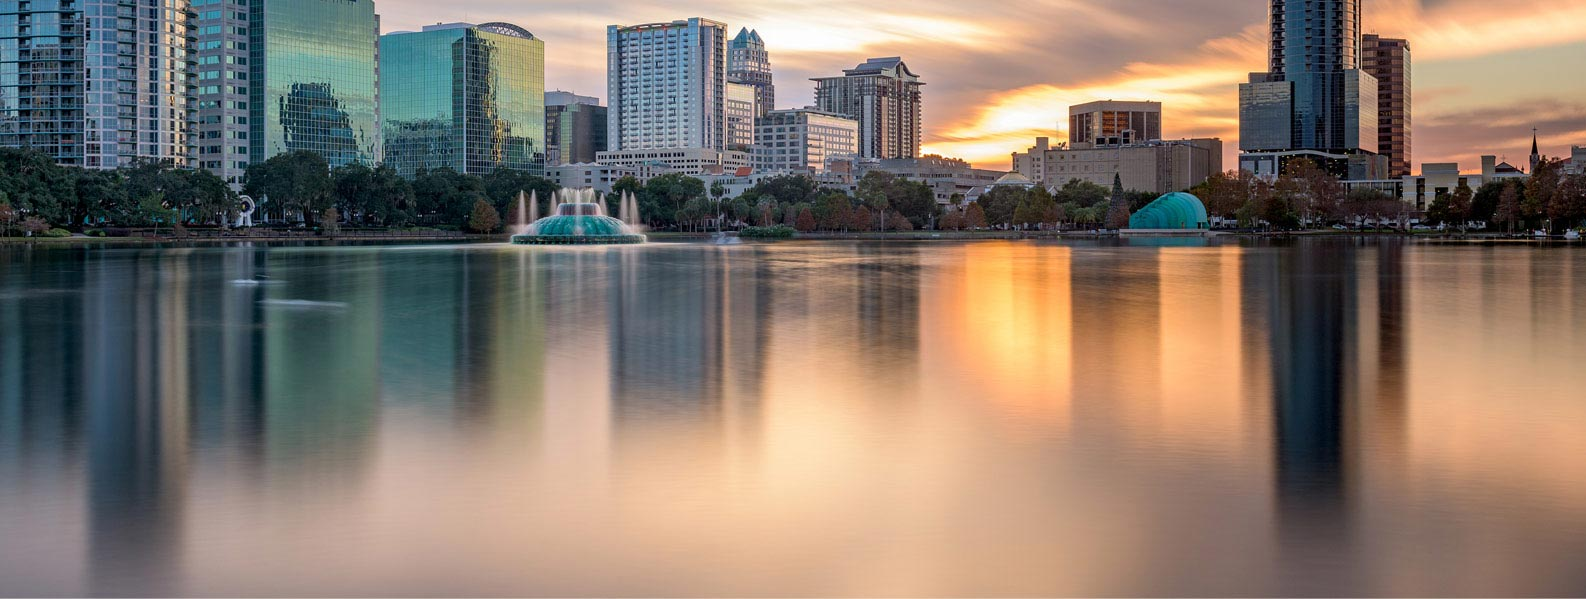 Orlando City at Dusk